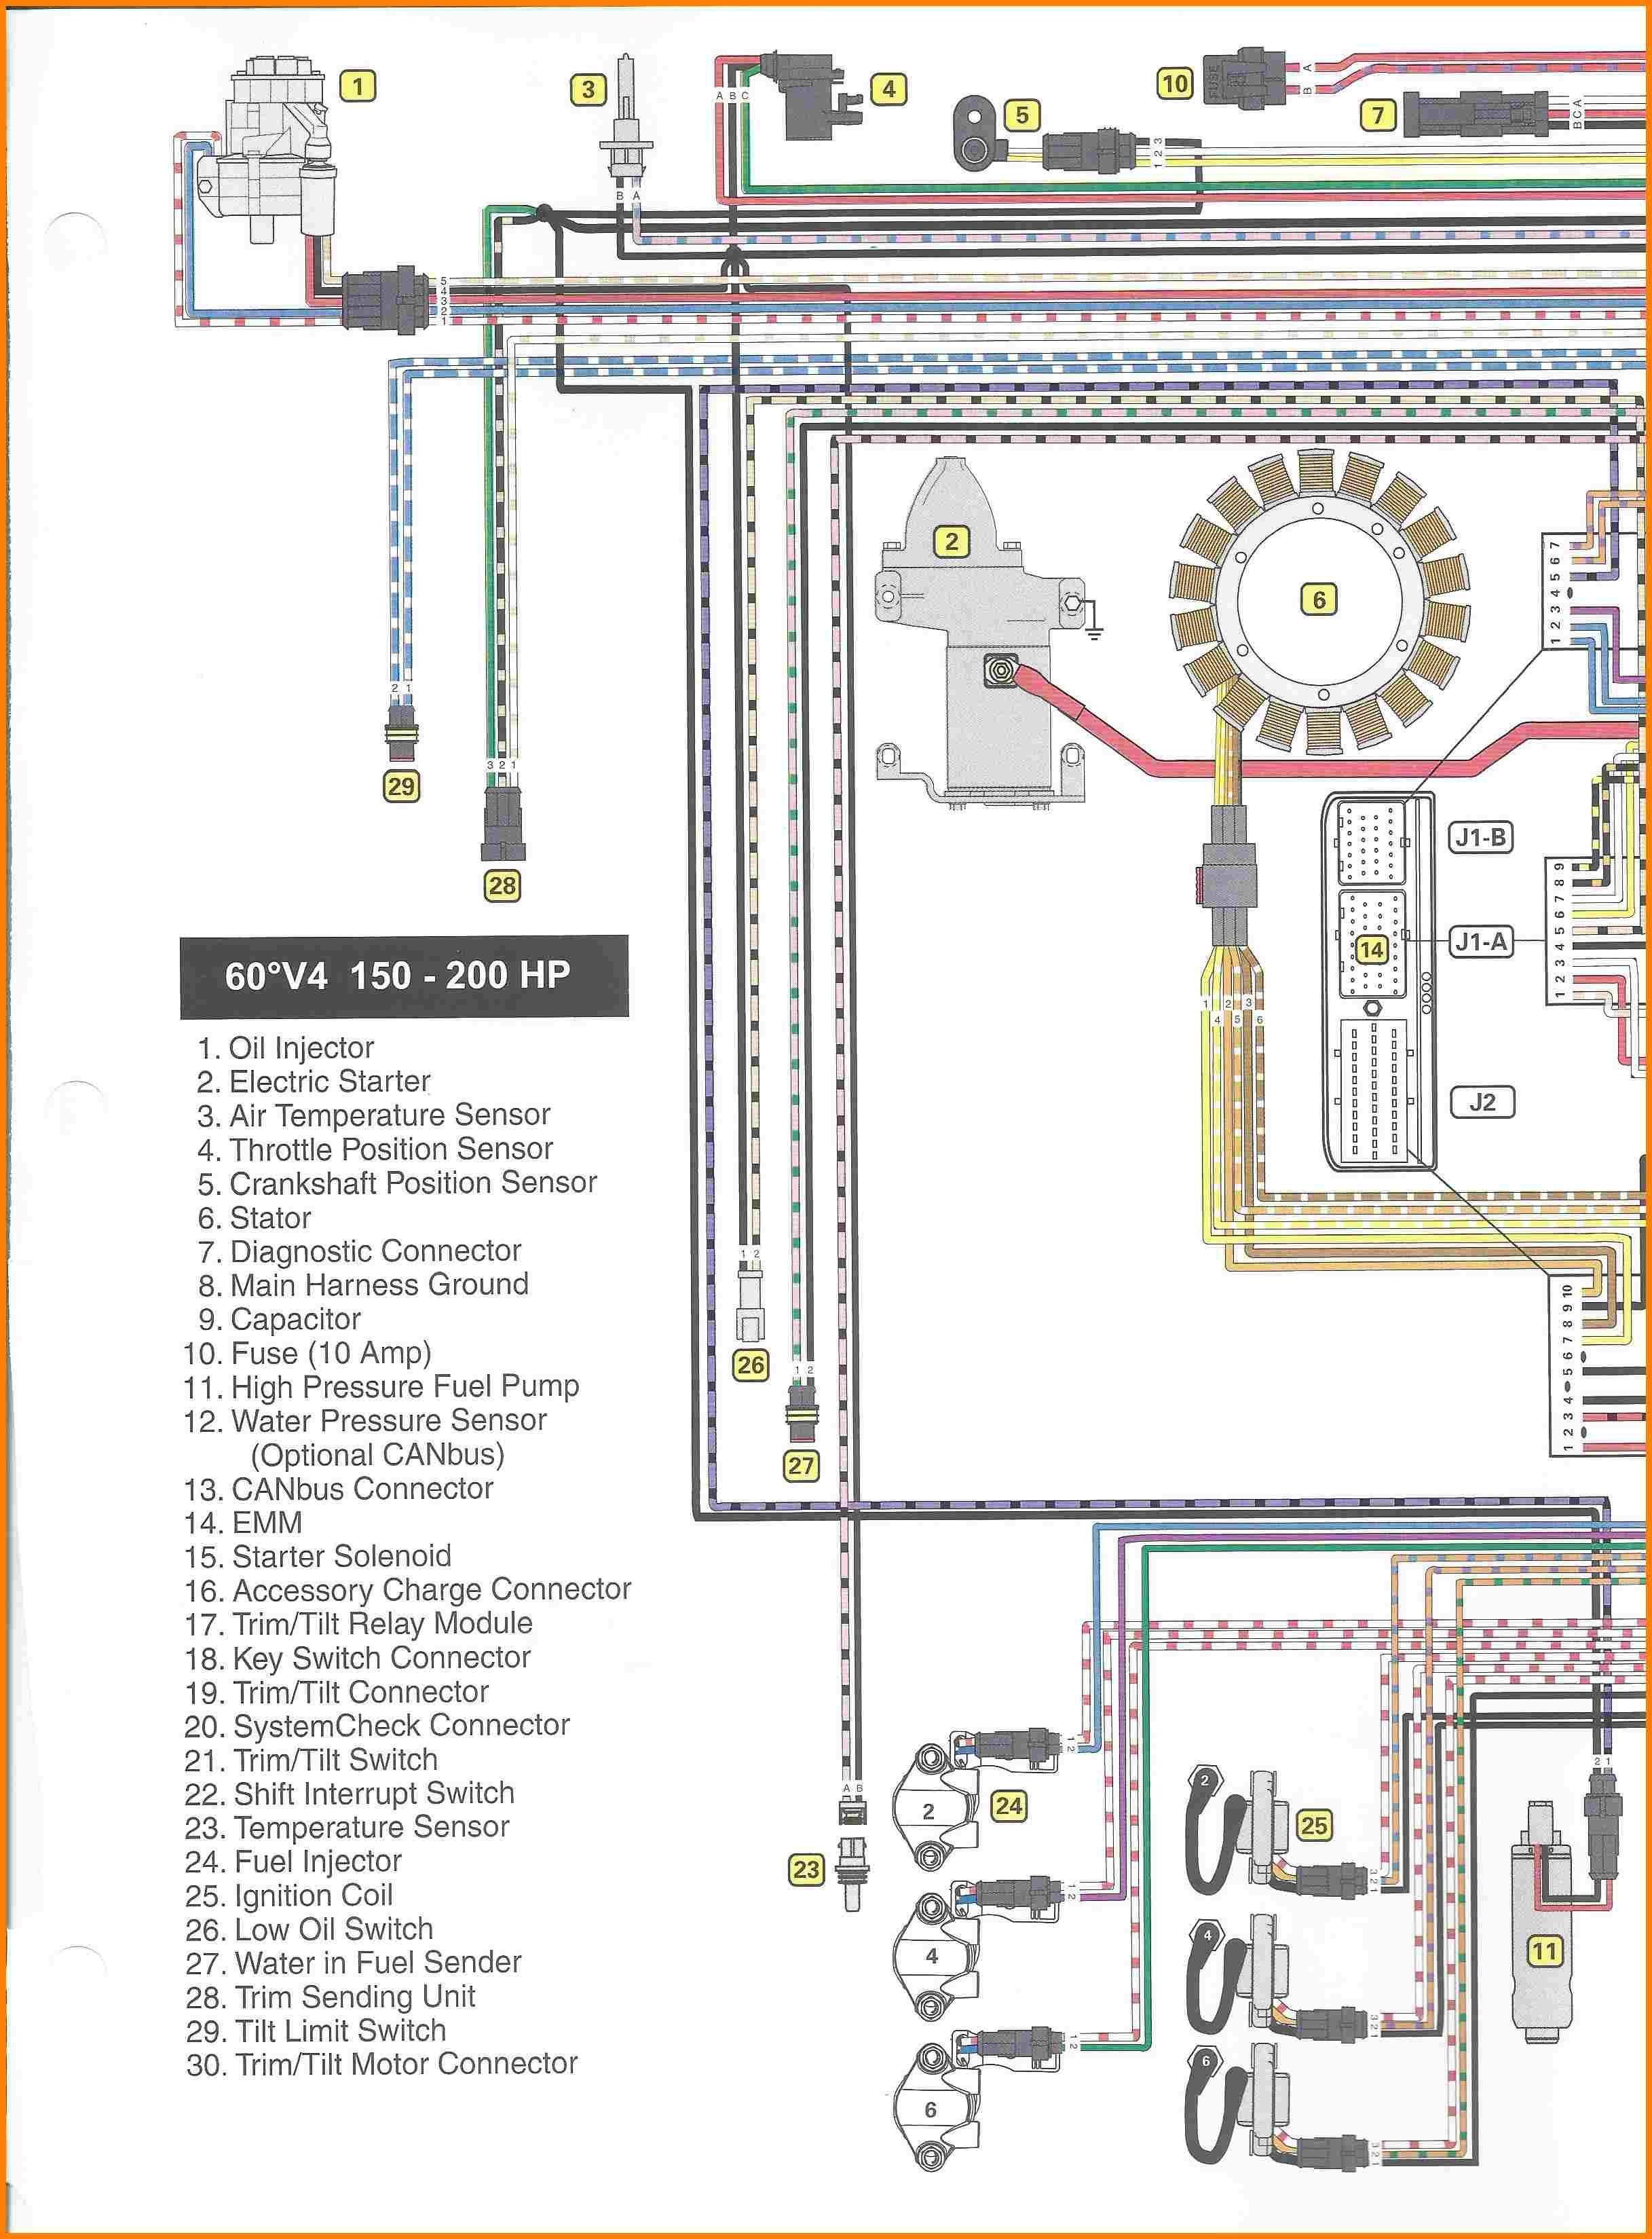 Diagram Lowe Fm 165 Wiring Diagram Full Version Hd Quality Wiring Diagram Car Wiring Media90 It